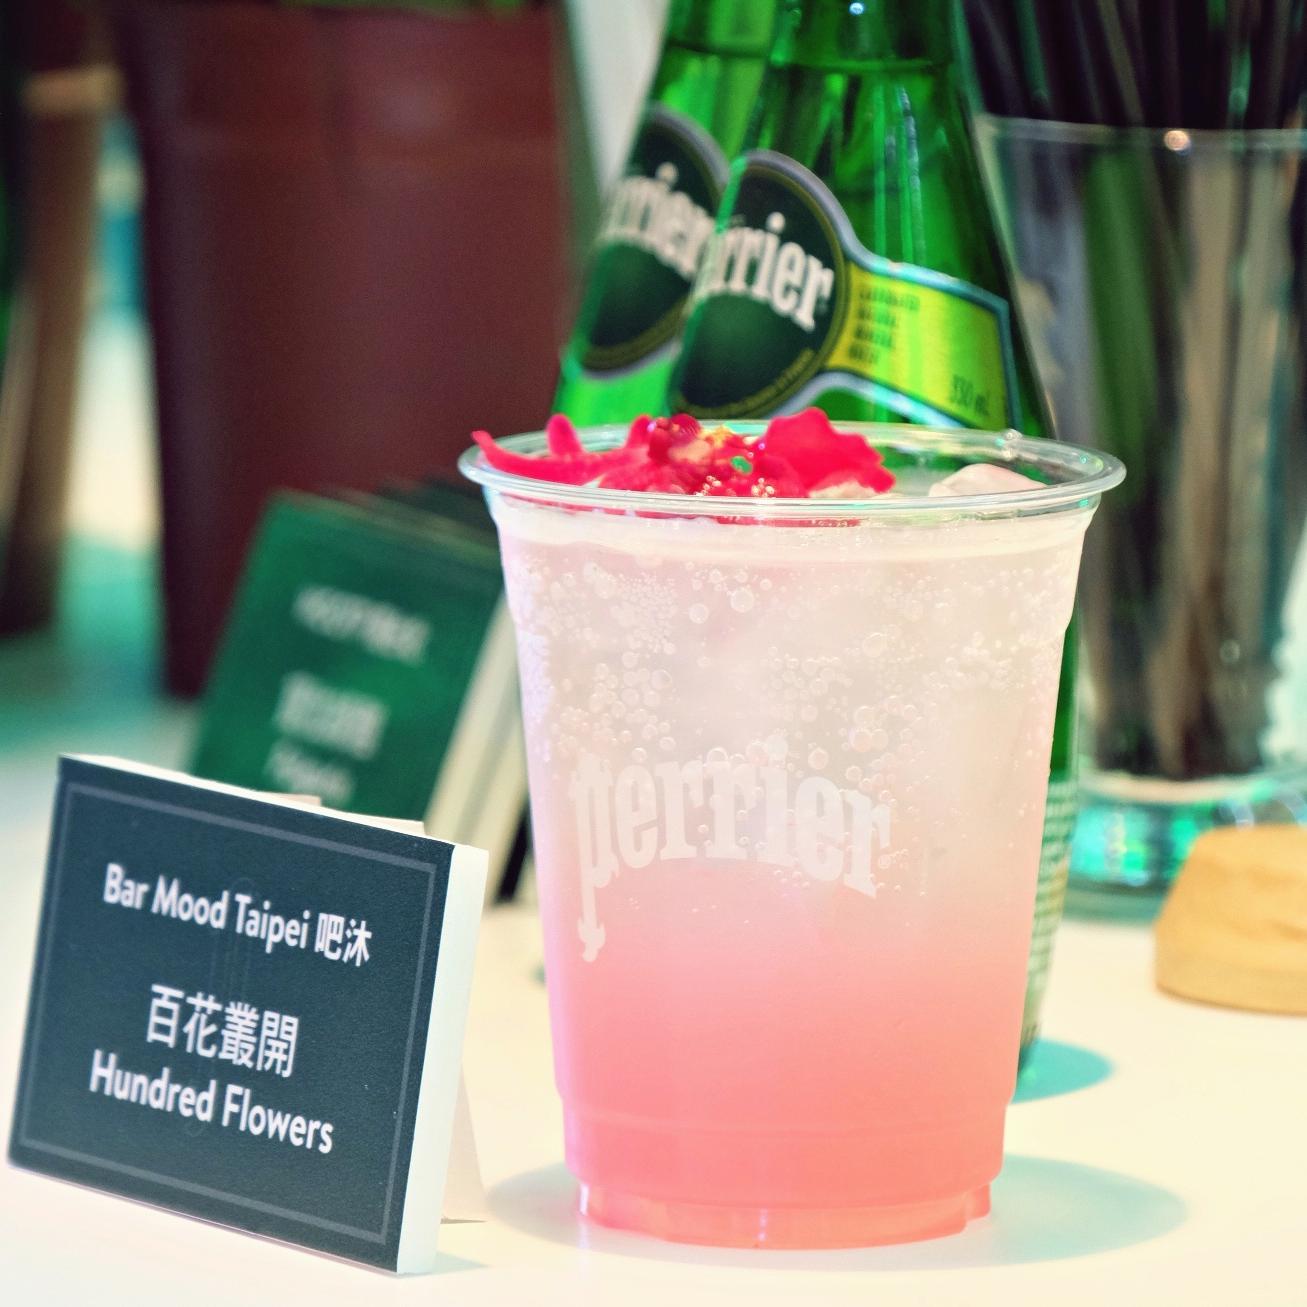 <p>打卡就送你喝!Perrier 攜手 10 家台北知名酒吧打造「夏日繽紛氣泡派對」</p>